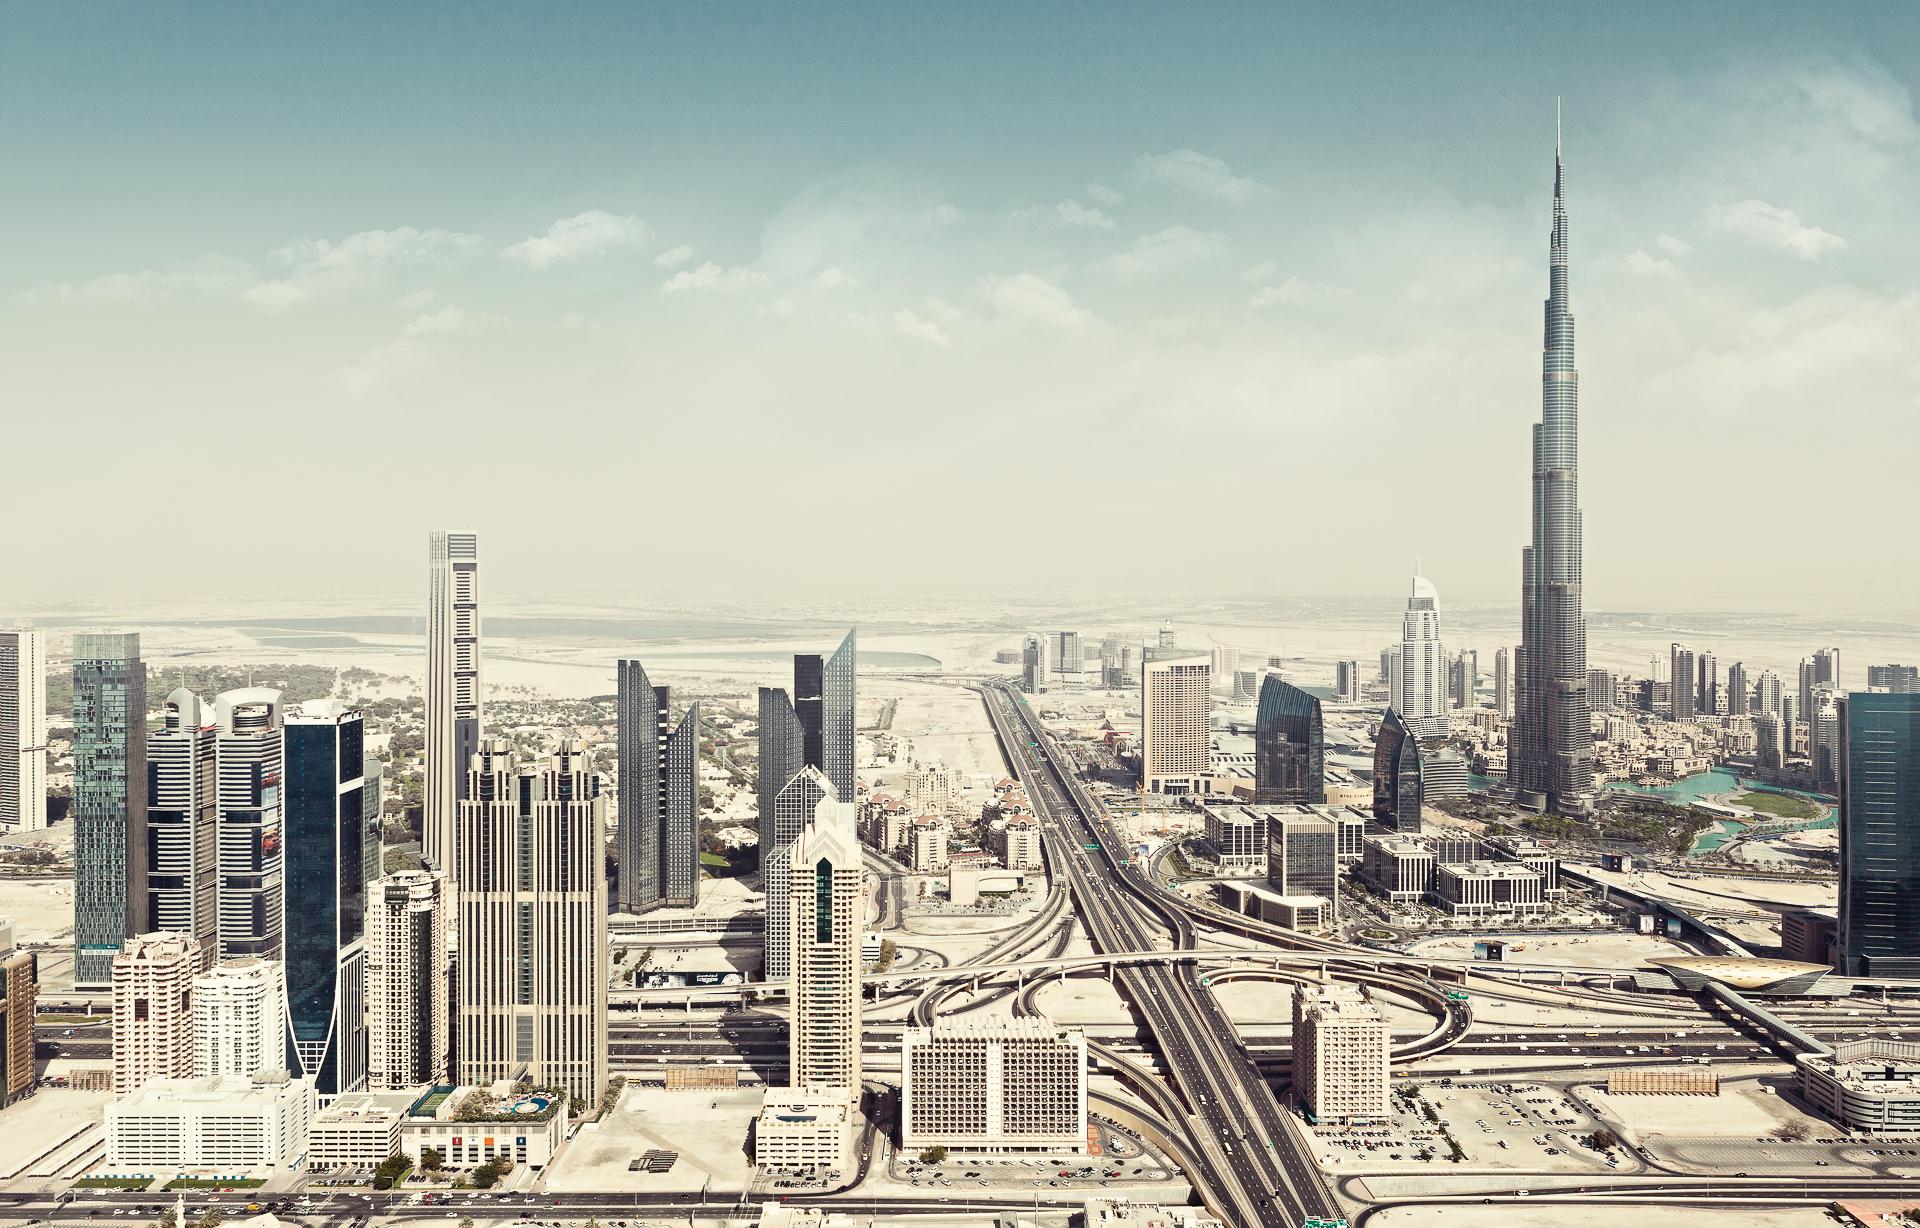 Gökhan_Orhan_Portfolio_Landscape_Dubai-9